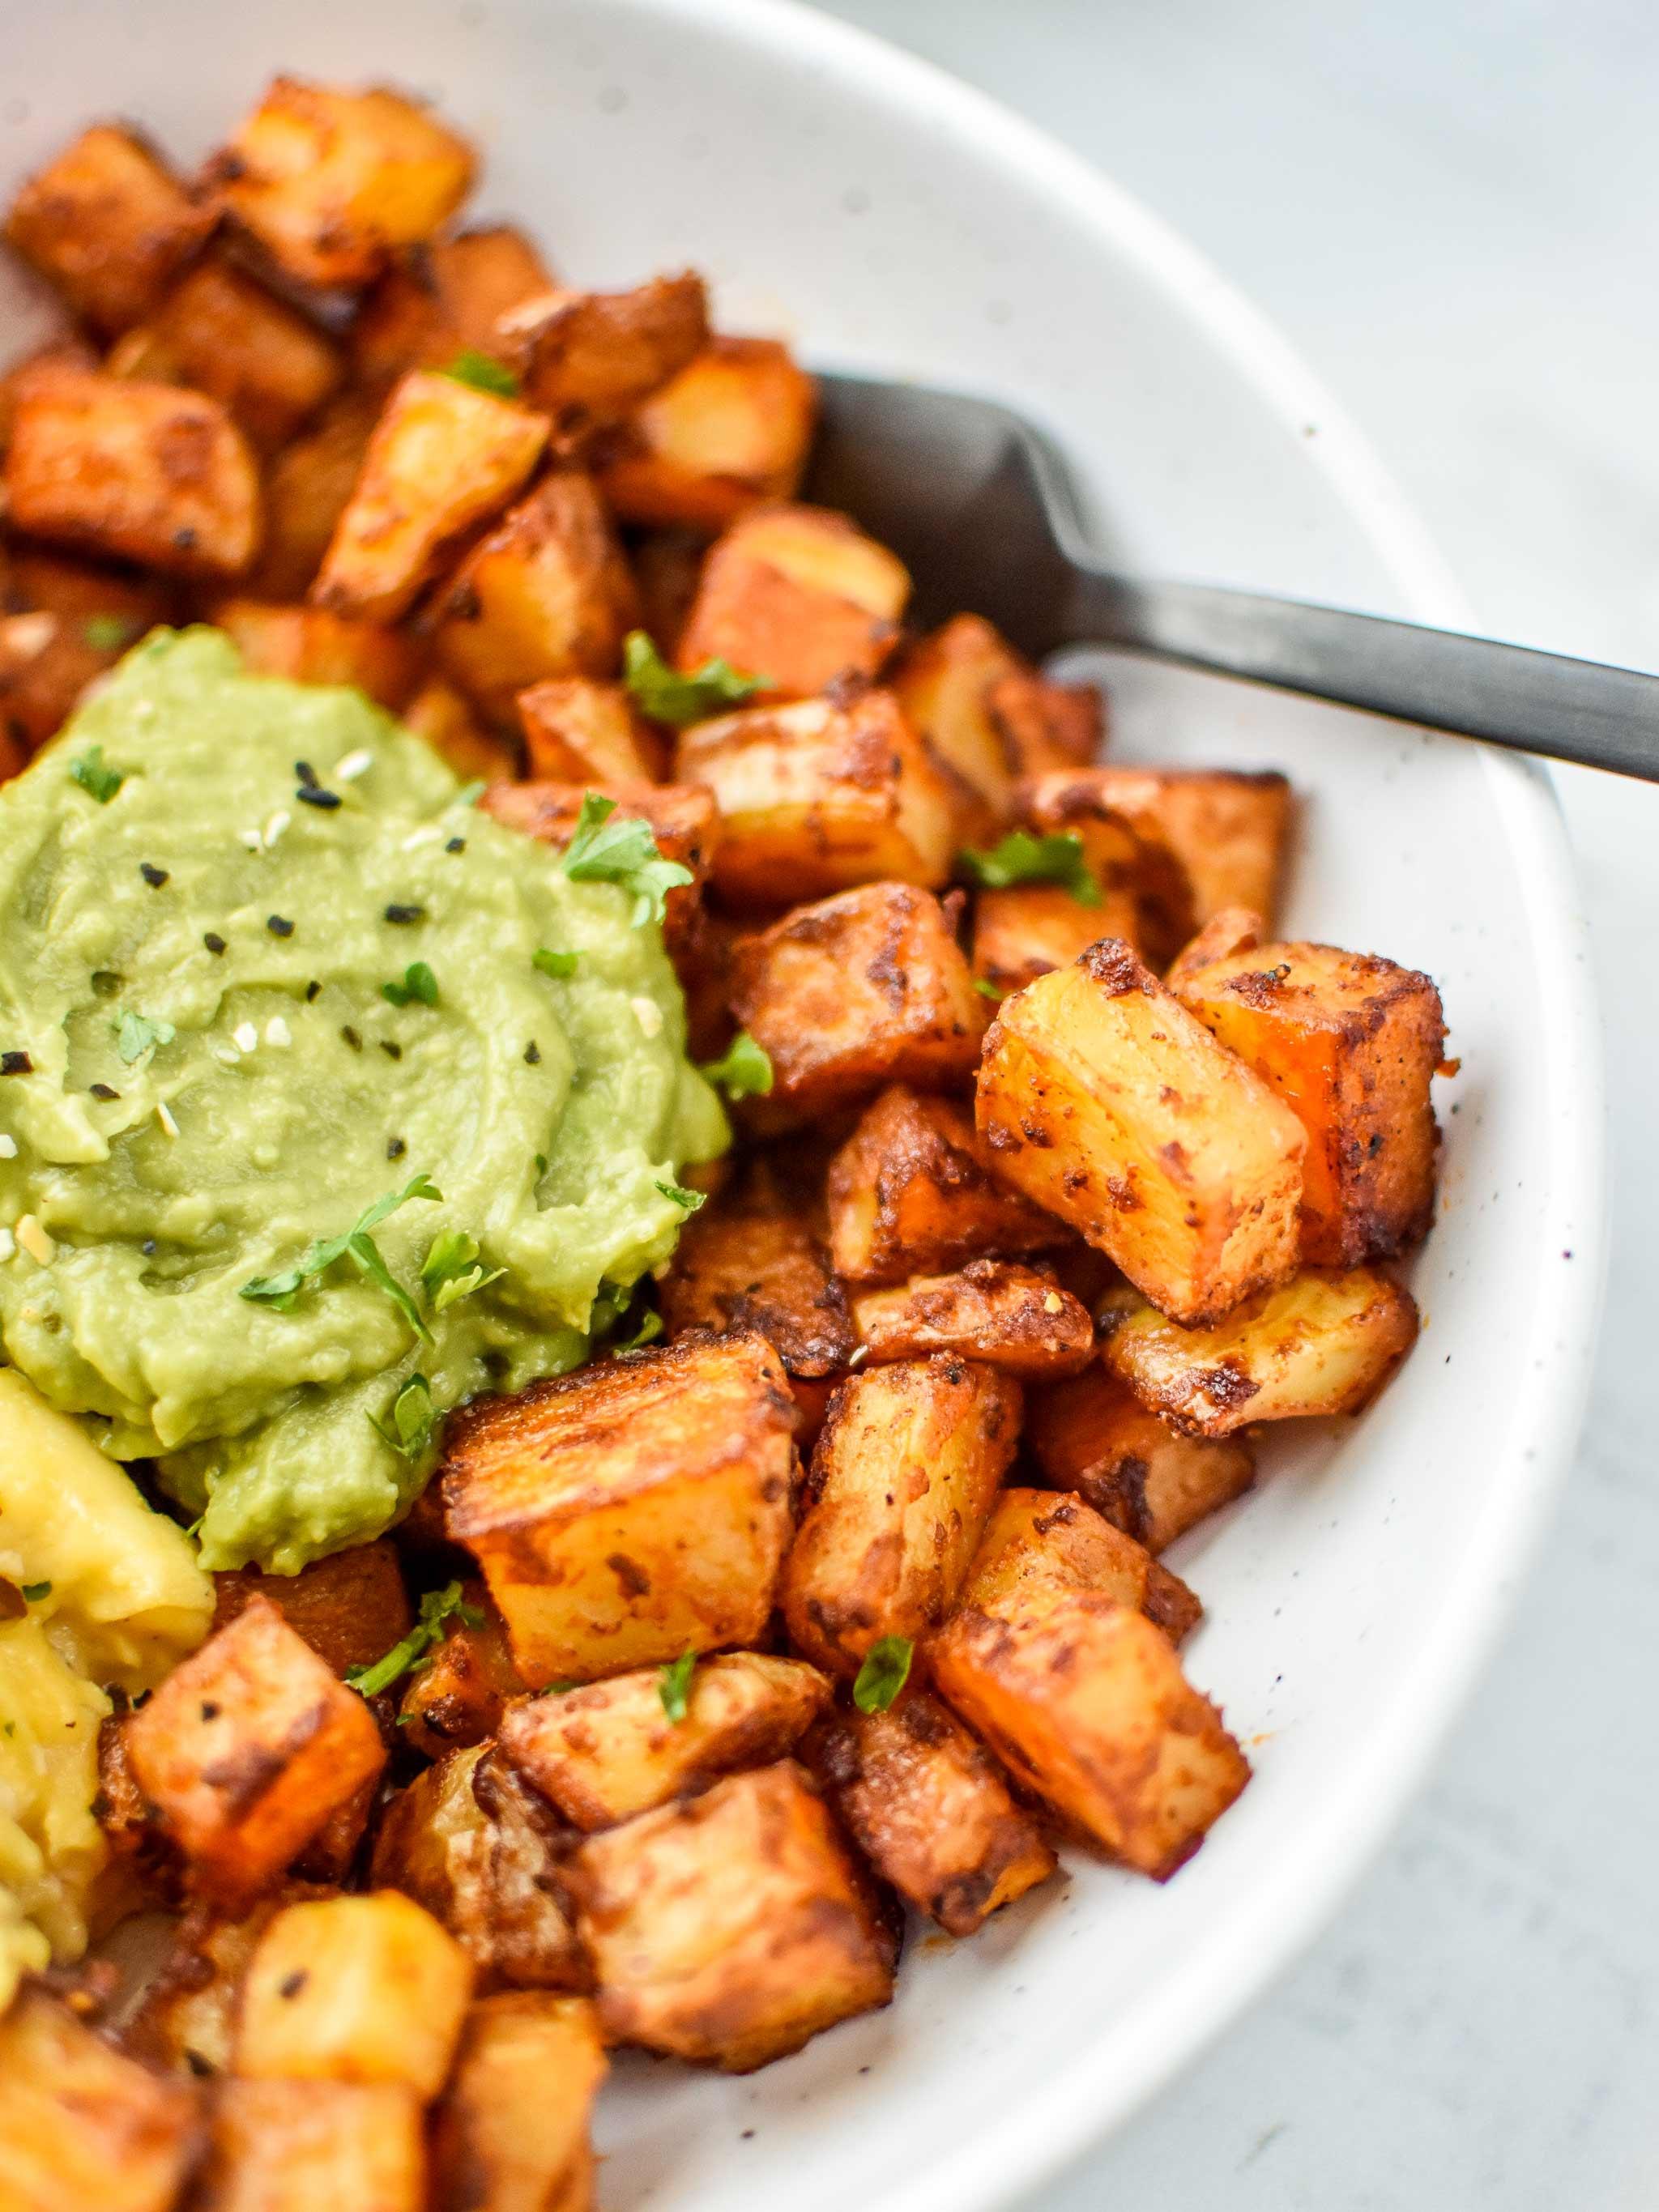 Basic oven breakfast potatoes with mashed avocado